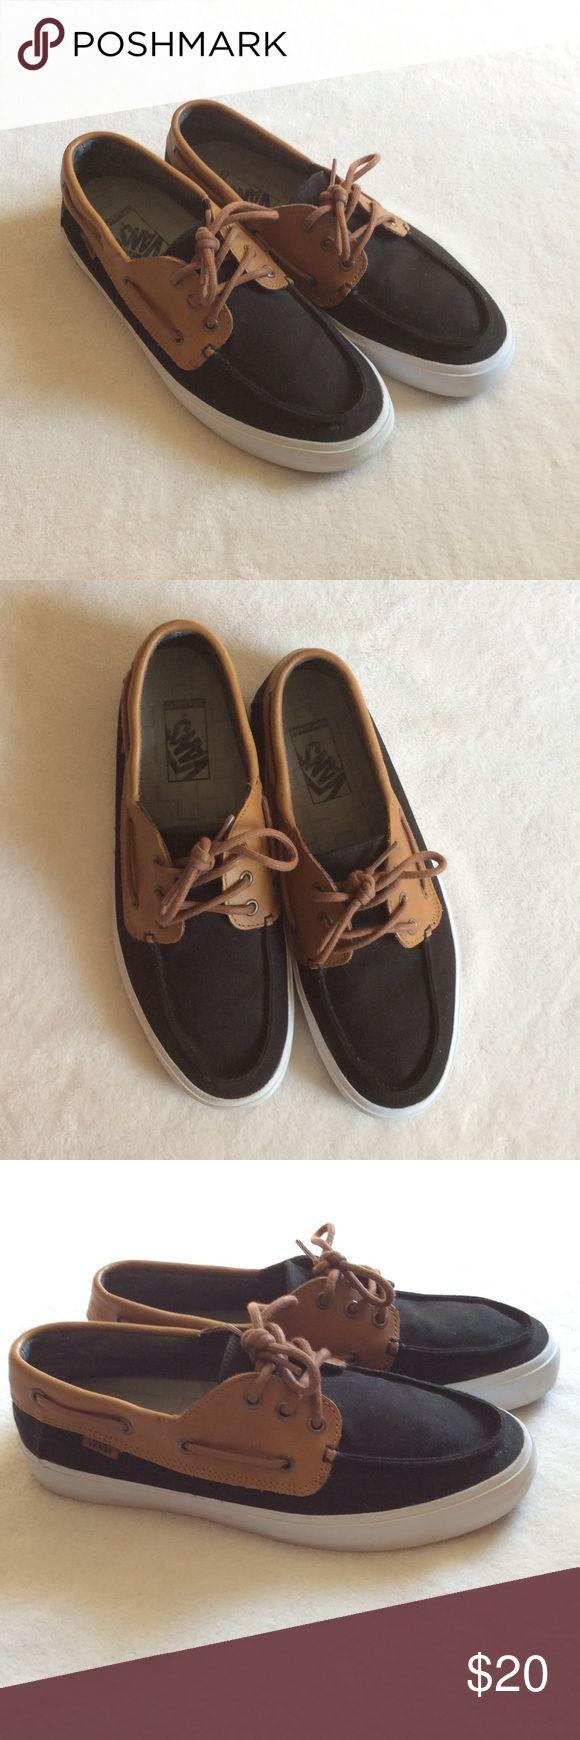 Vans boat shoes Vans canvas boat shoes. Colors are black and brown. Vans Shoes Boat Shoes